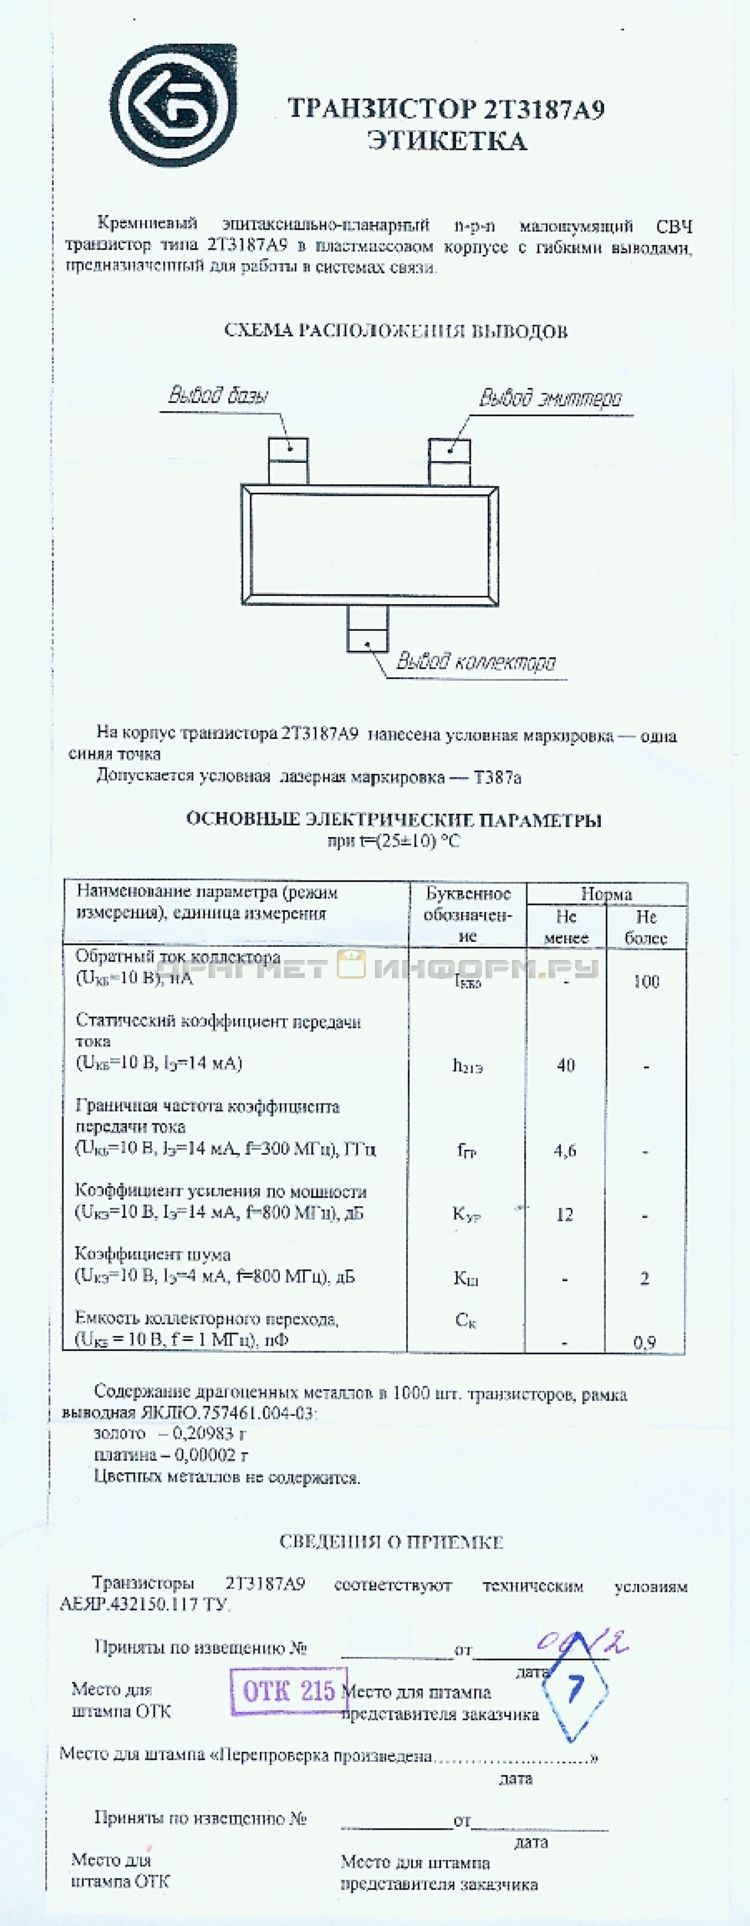 Формуляр 2Т3187А9